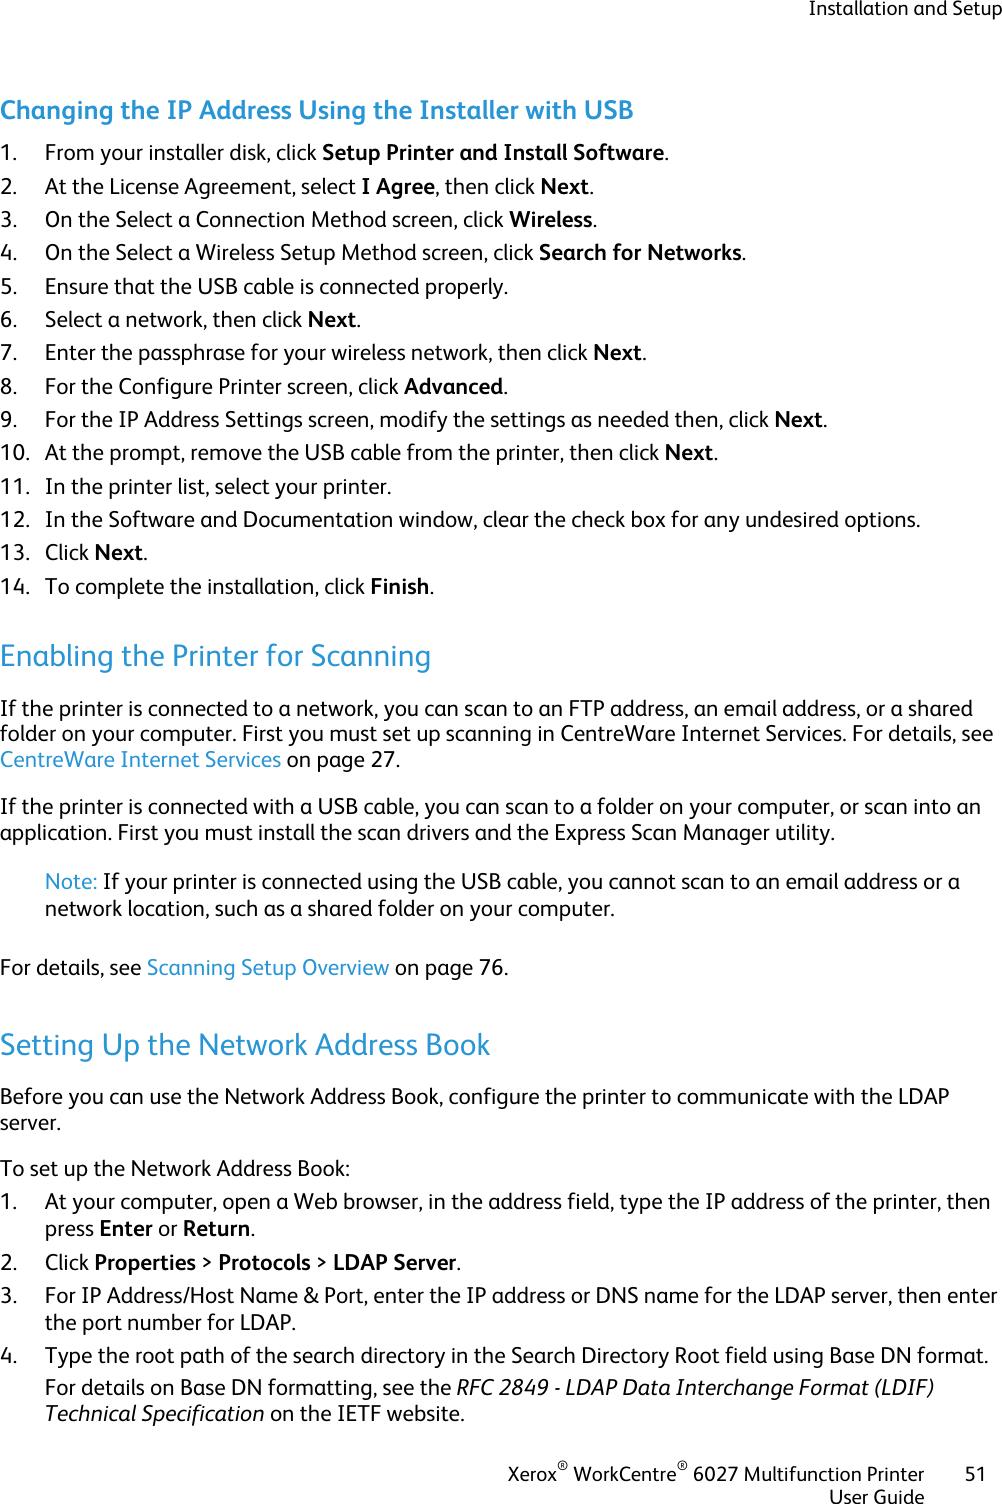 Xerox Workcentre 6027 Users Manual Xerox® WorkCentre® Multifunction